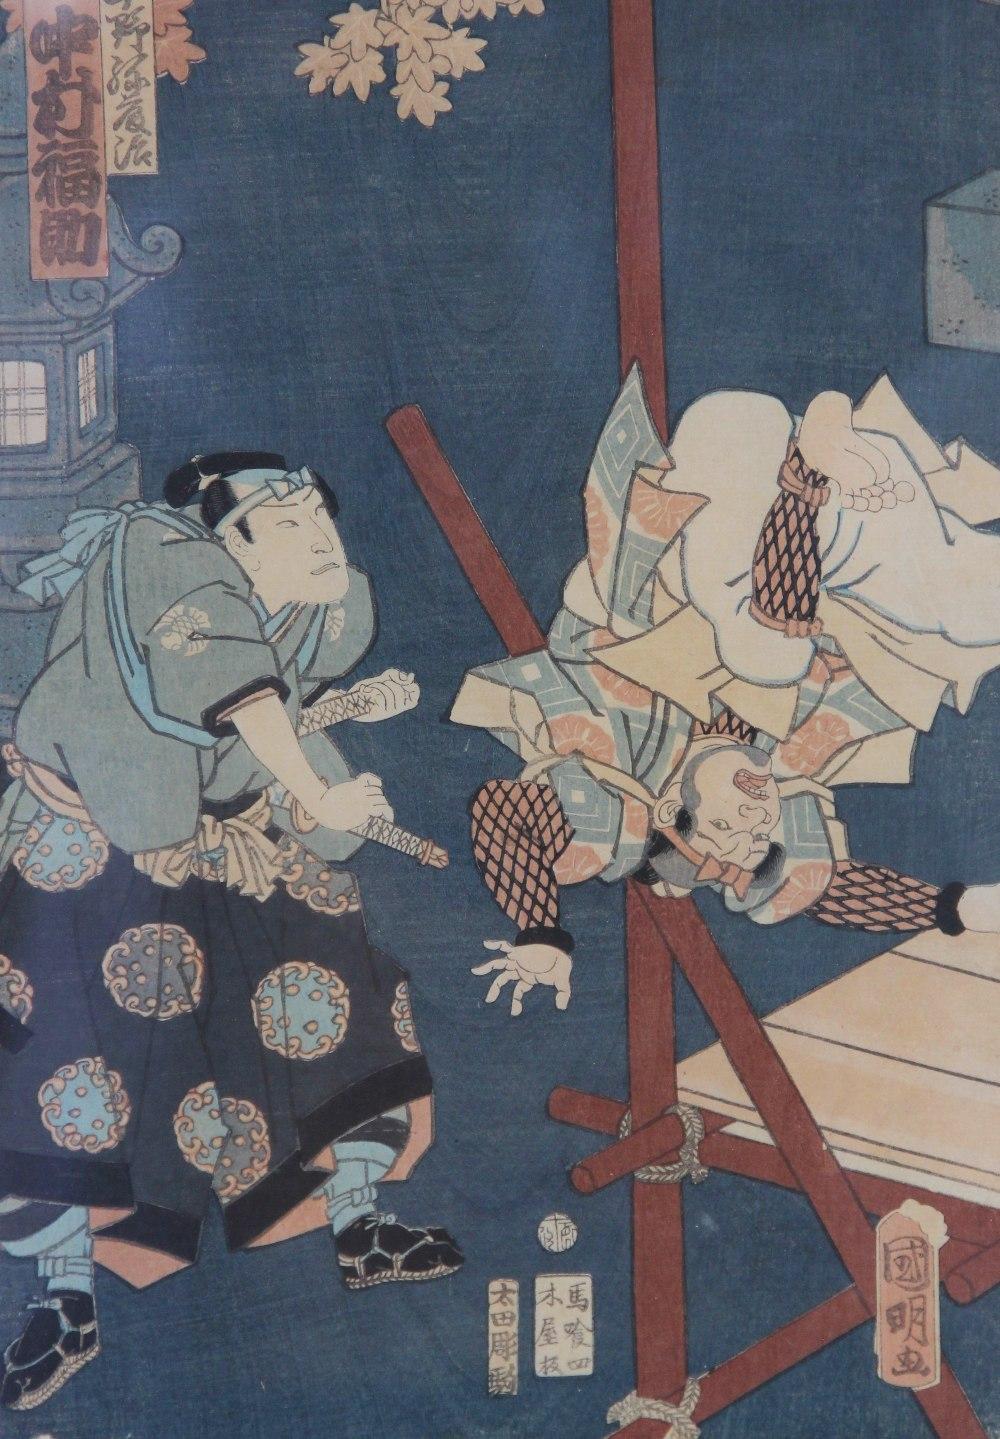 A Japanese Ukiyo-e school woodblock print, late 18th or early 19th century, attributed to Utagawa